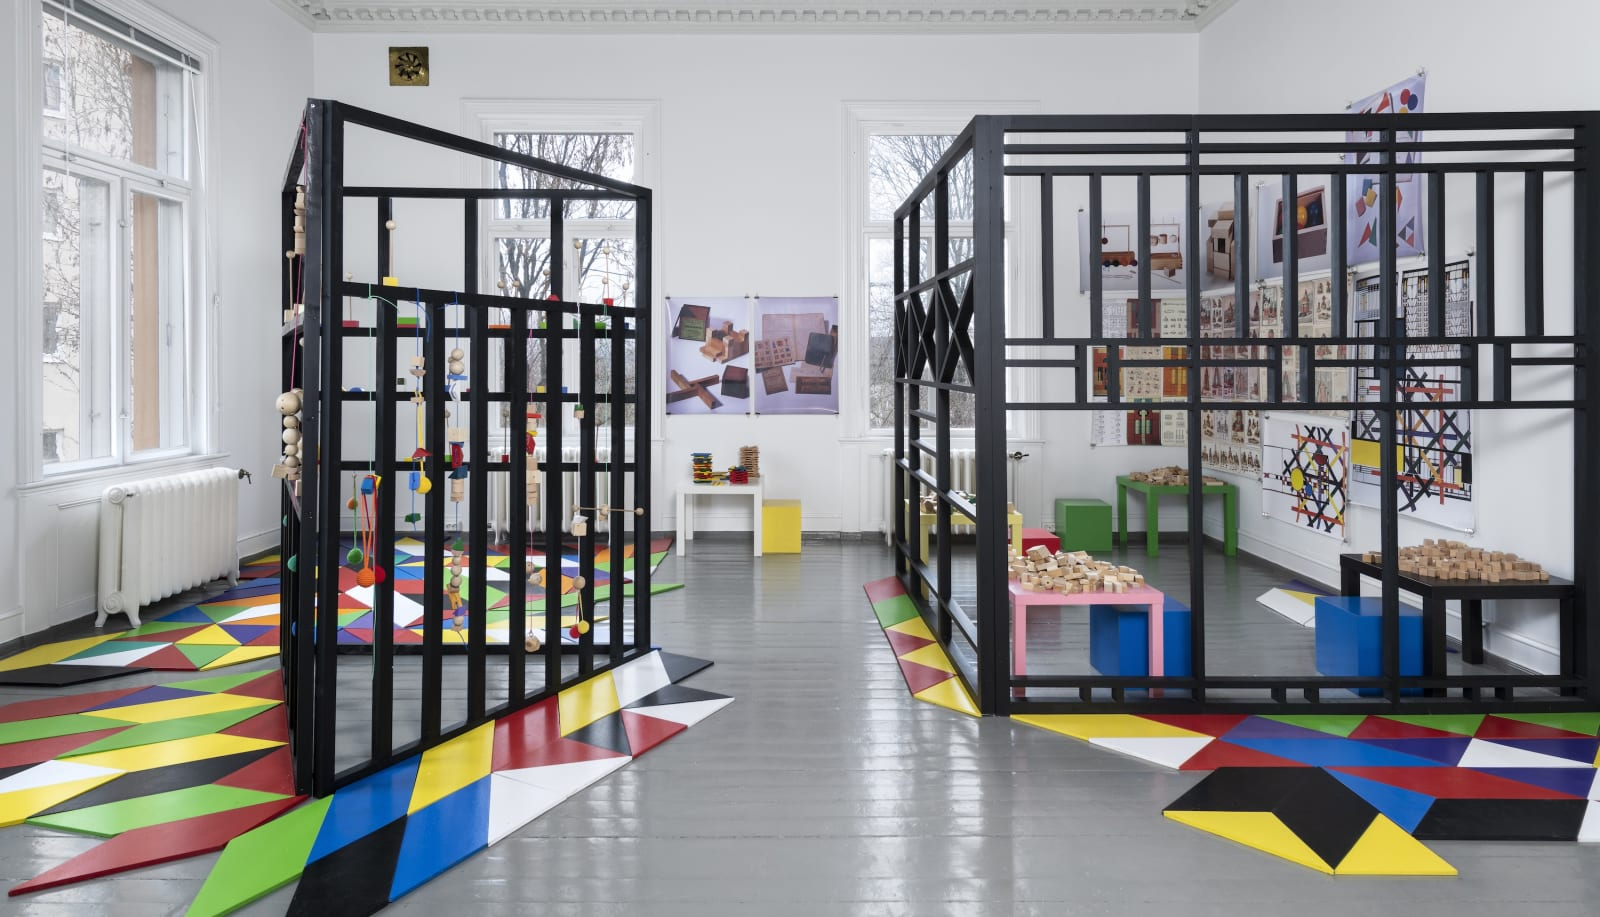 Fröbel Studio: Institutt for kreativitet, Norwegian Sculptors Society, Oslo, 2020